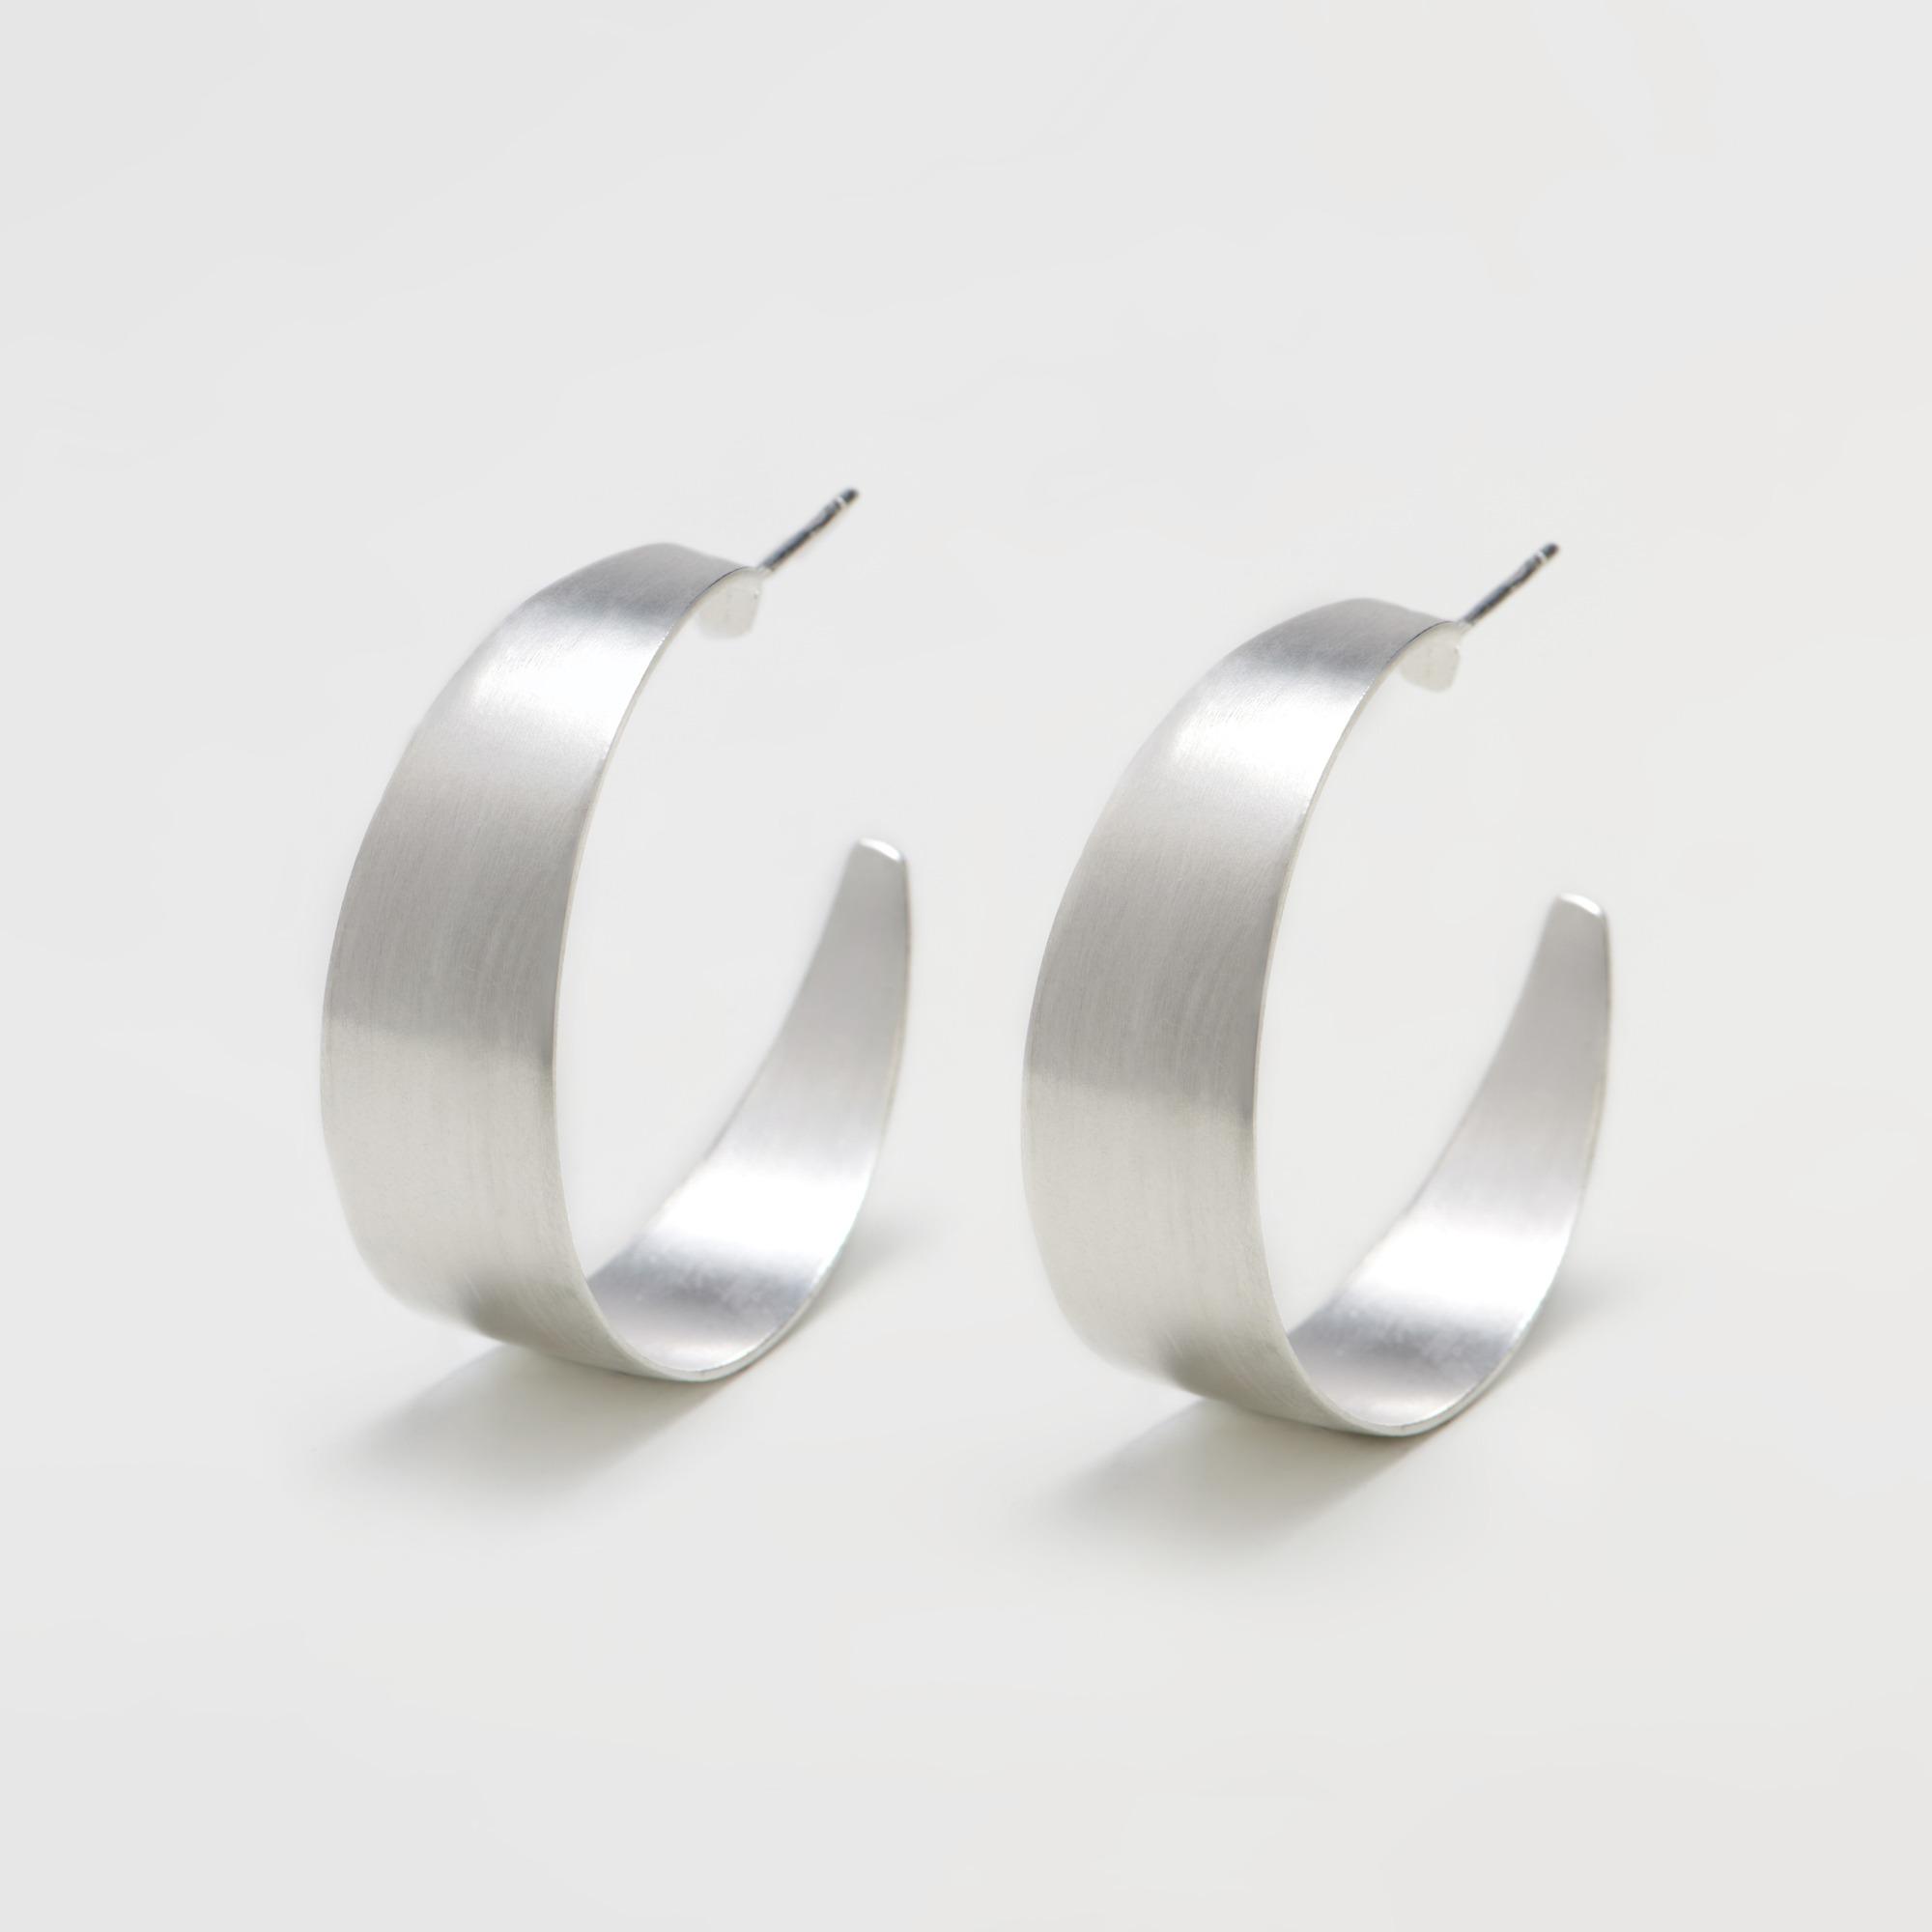 100-08 Imany hoops σκουλαρίκια ασημένια